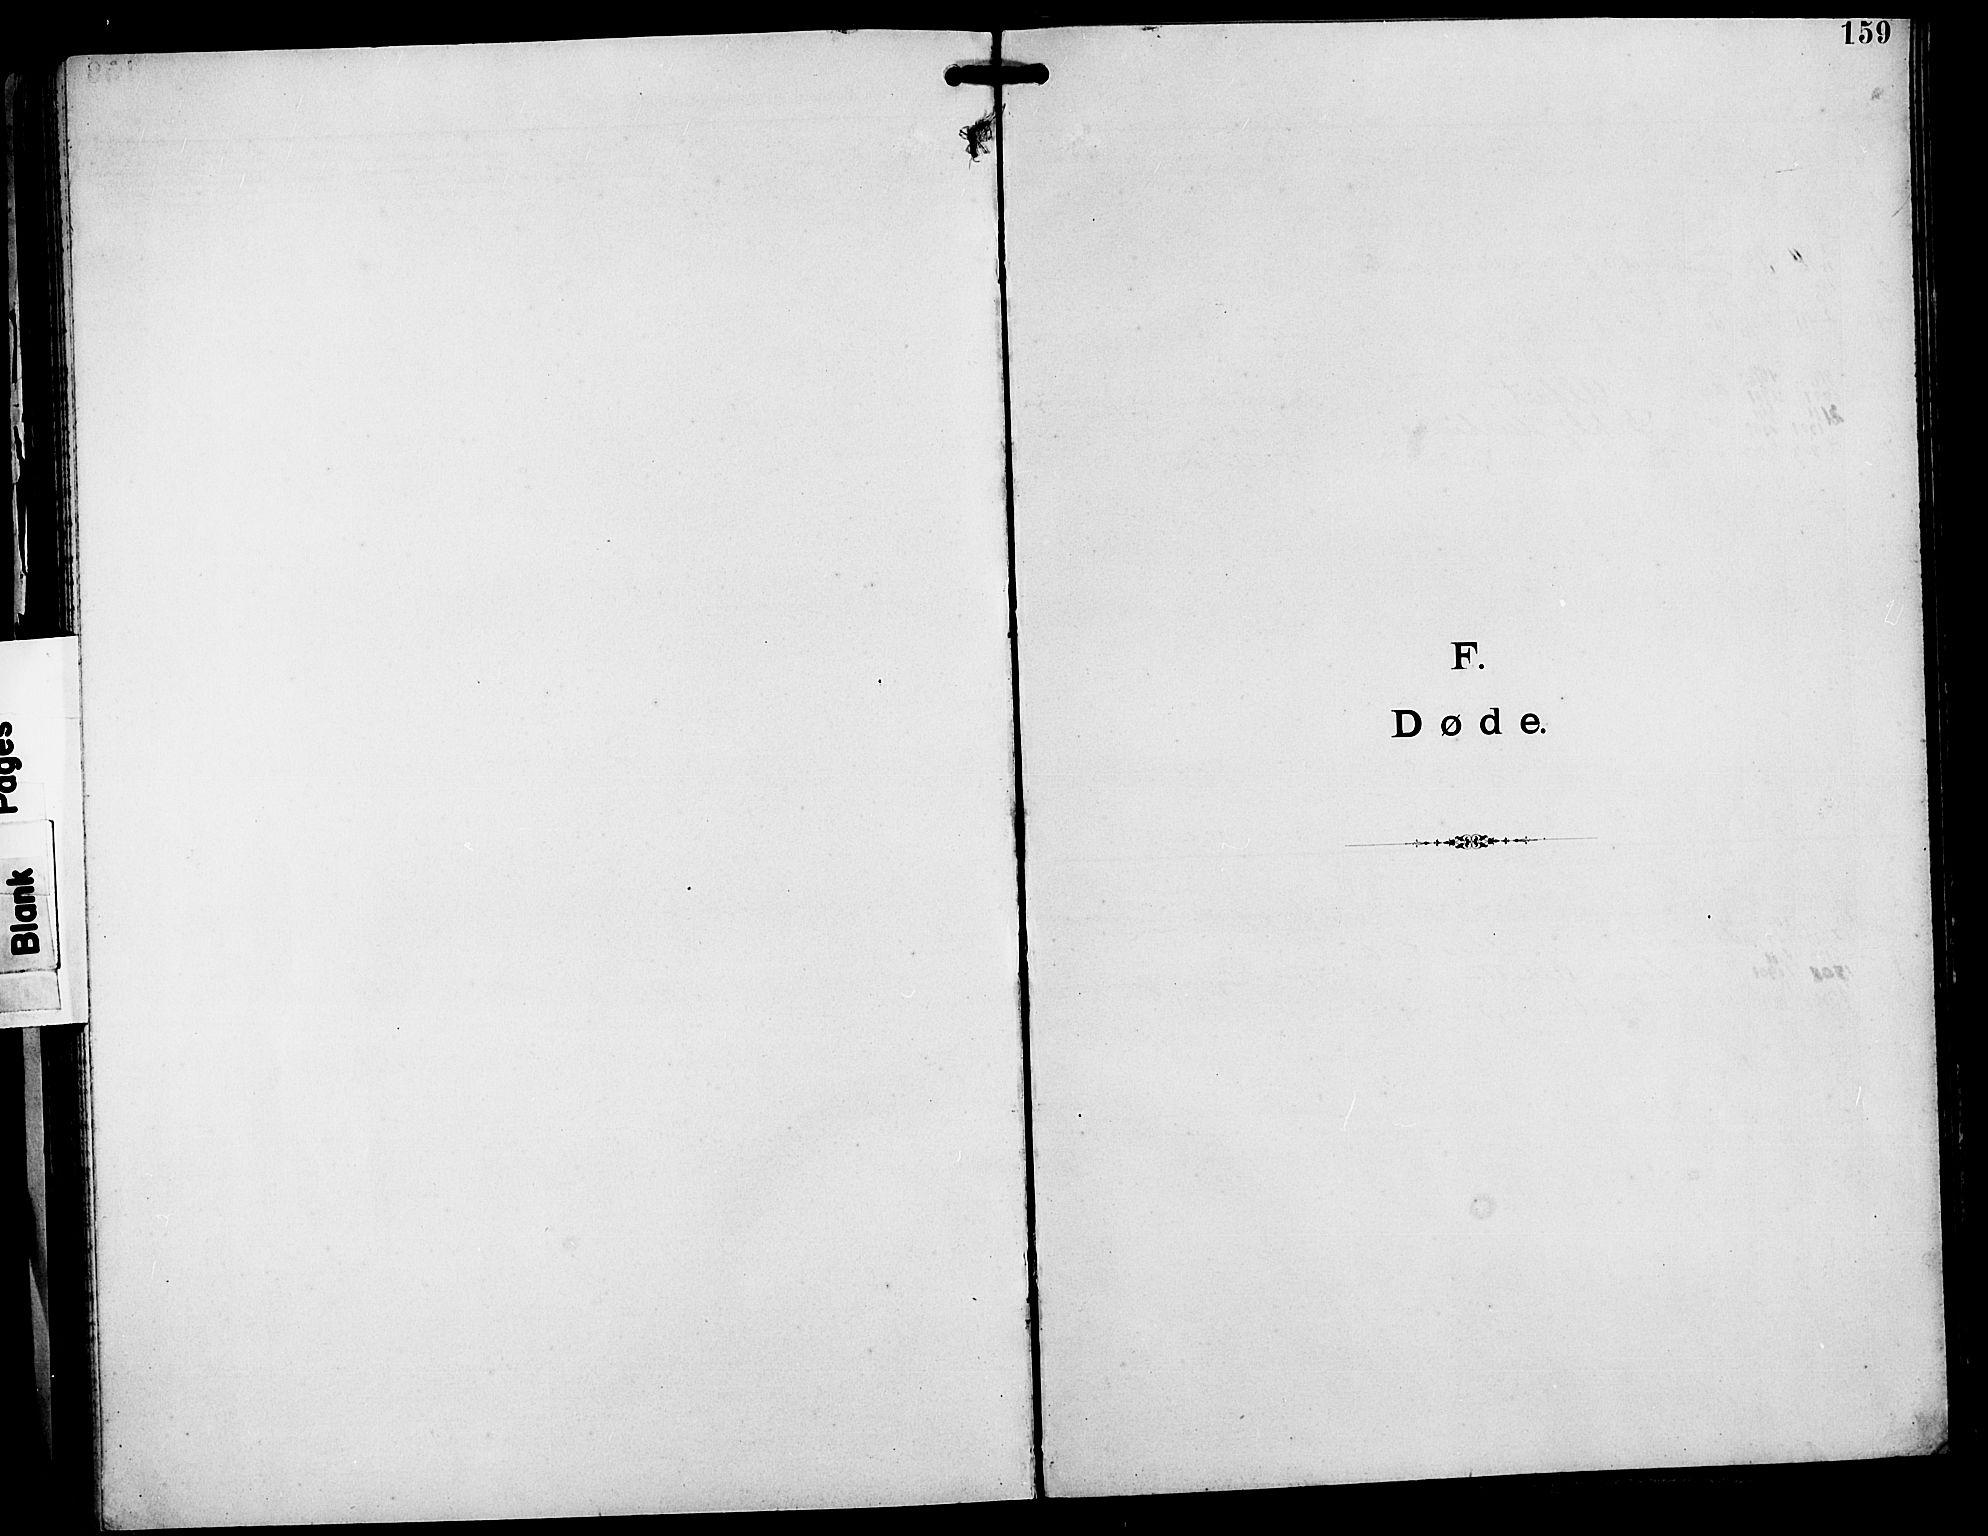 SAST, Stavanger amt*, Dissenterprotokoll nr. -, 1892-1902, s. 159